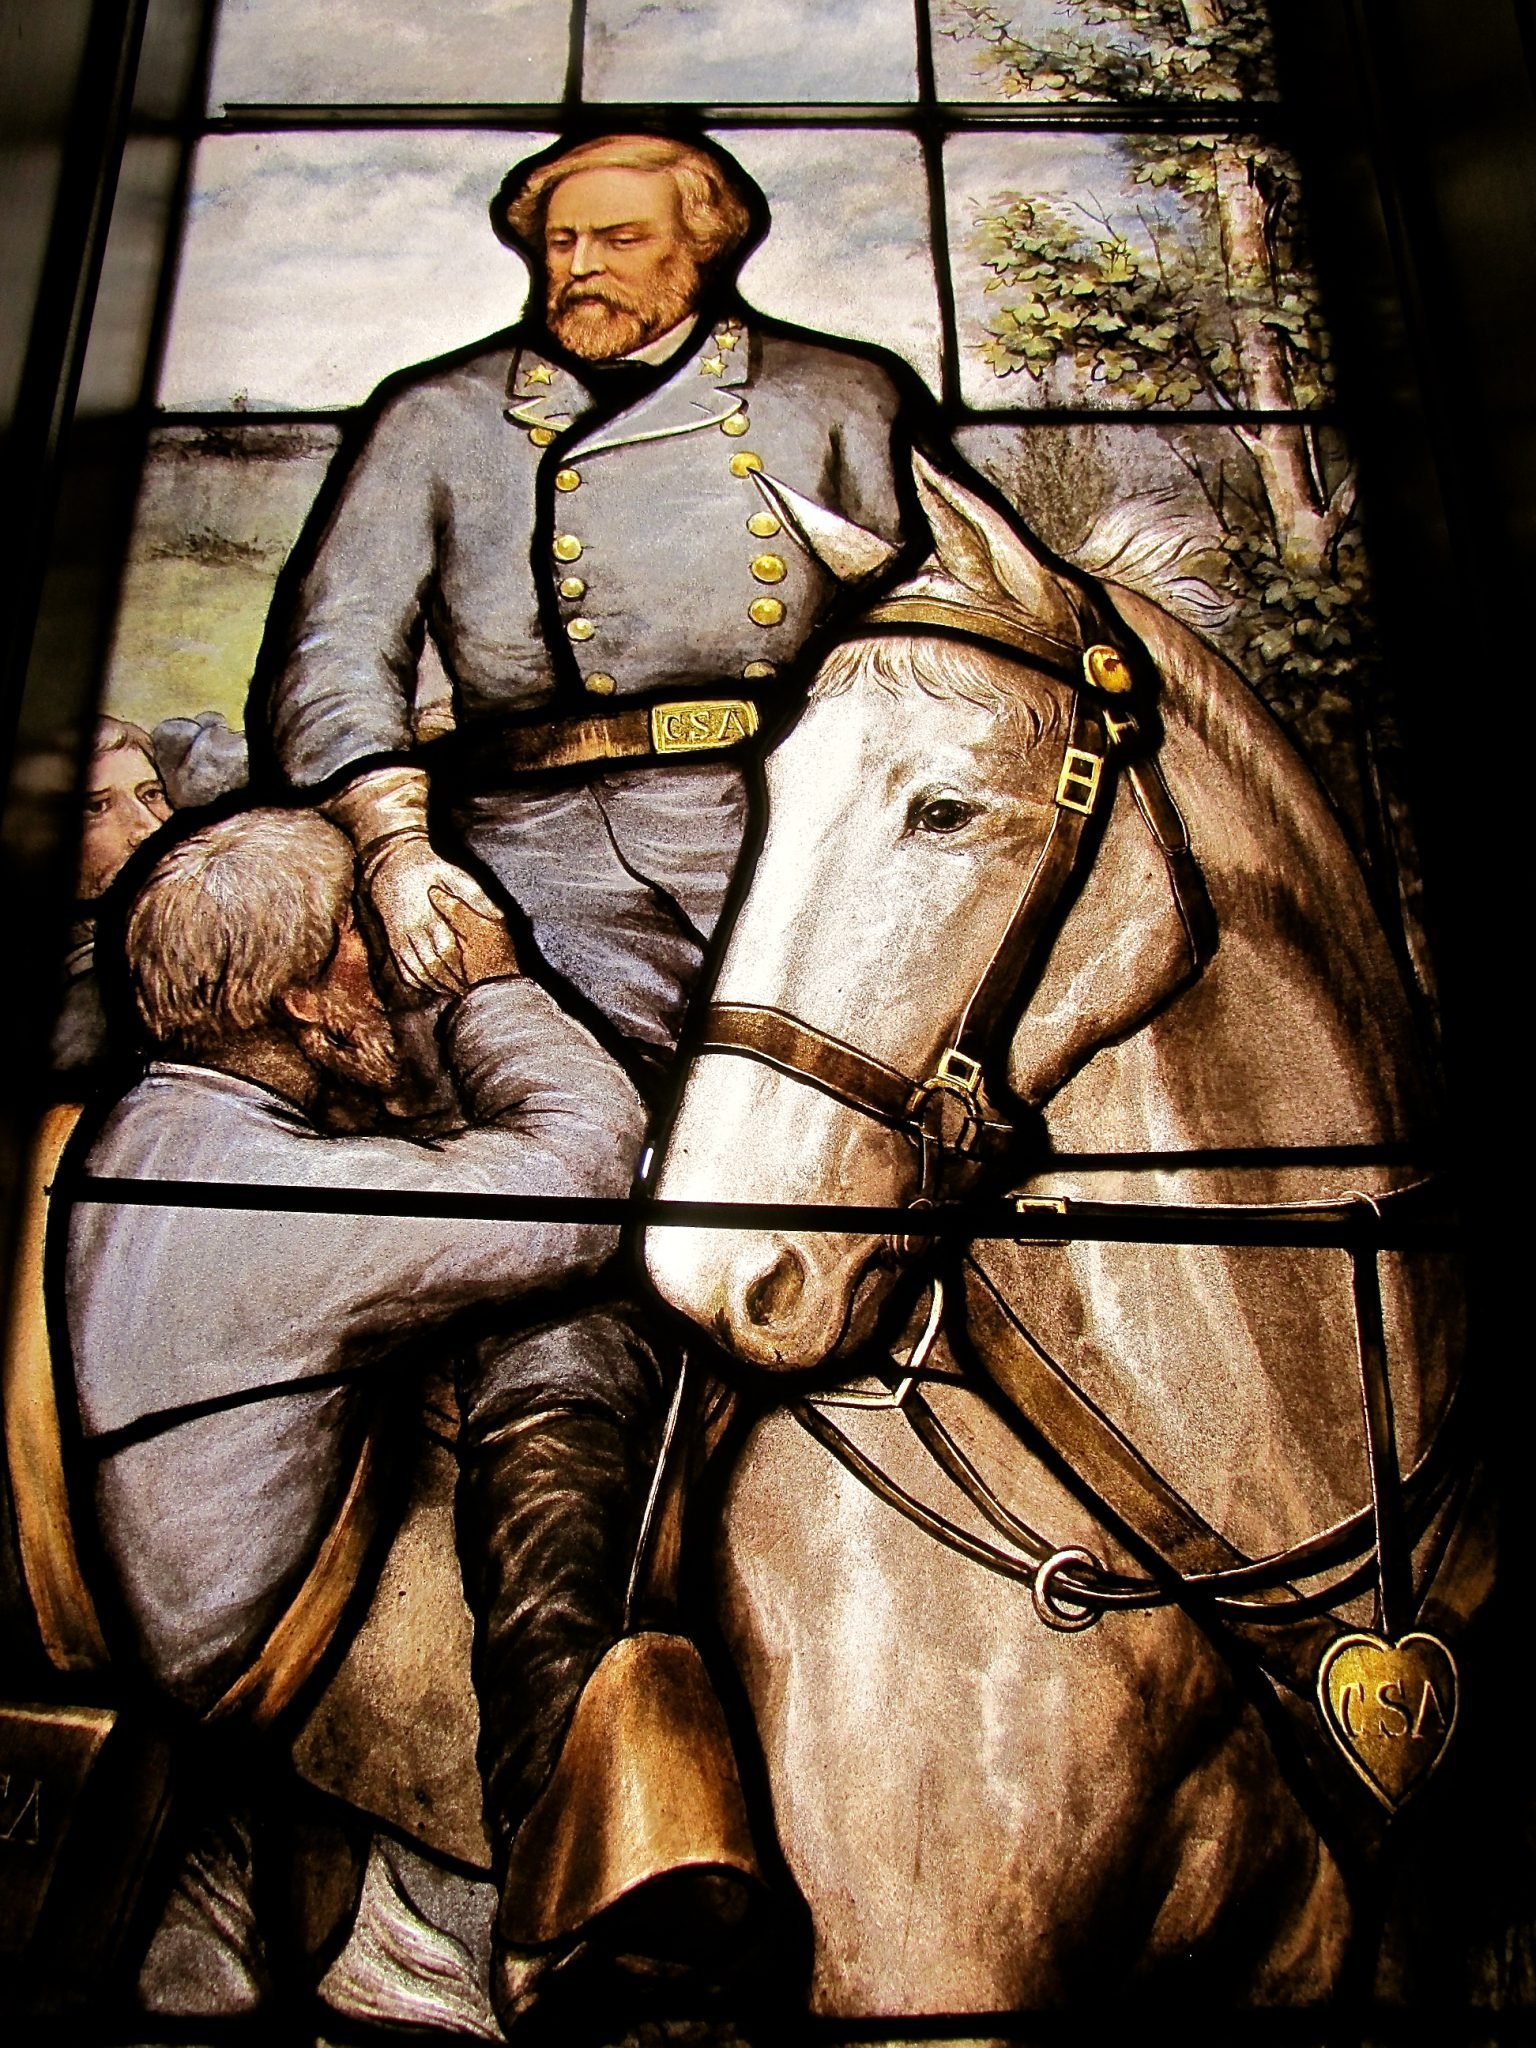 Image of Robert E. Lee in Rhodes Hall (Richard Utz, Public Medievalist)